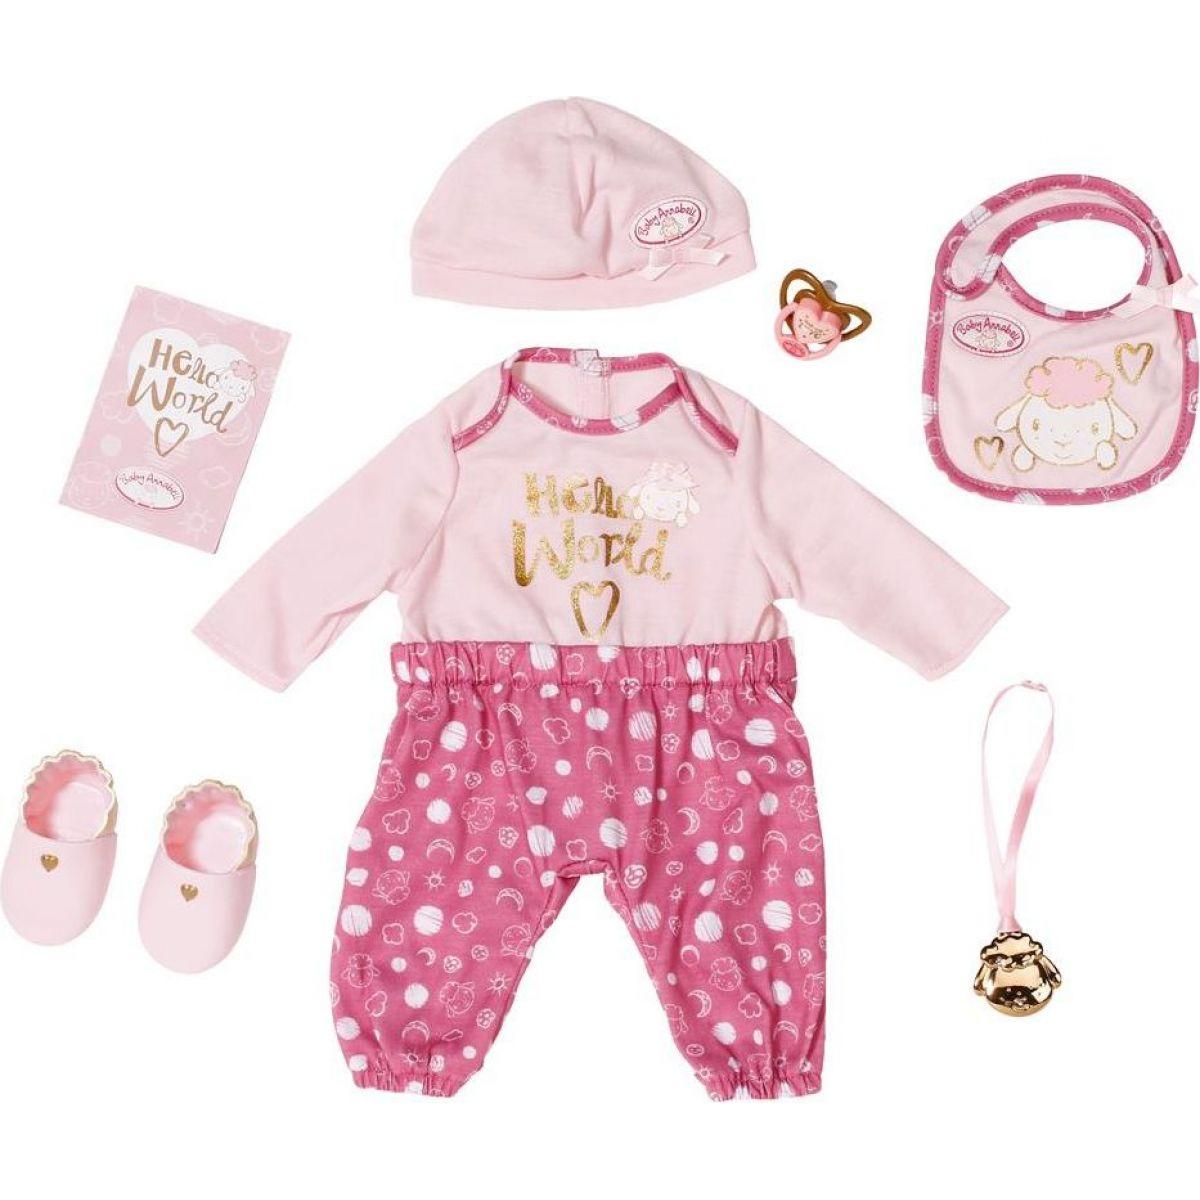 Zapf Creation Baby Annabell Súprava pre bábätko Deluxe, 43 cm